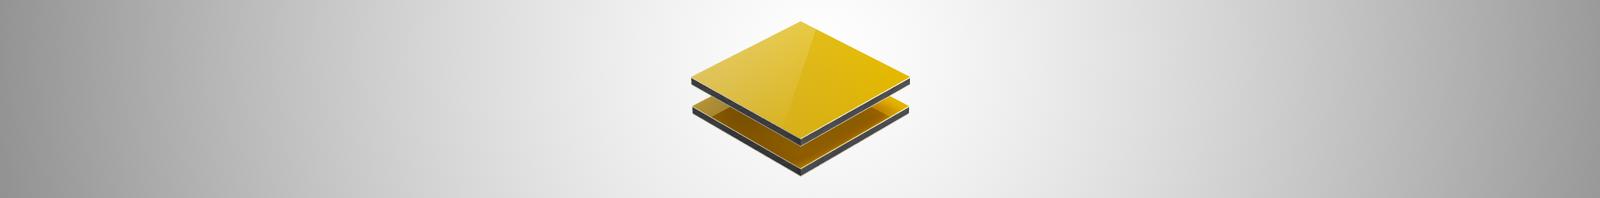 Katalog warna Acp Seven